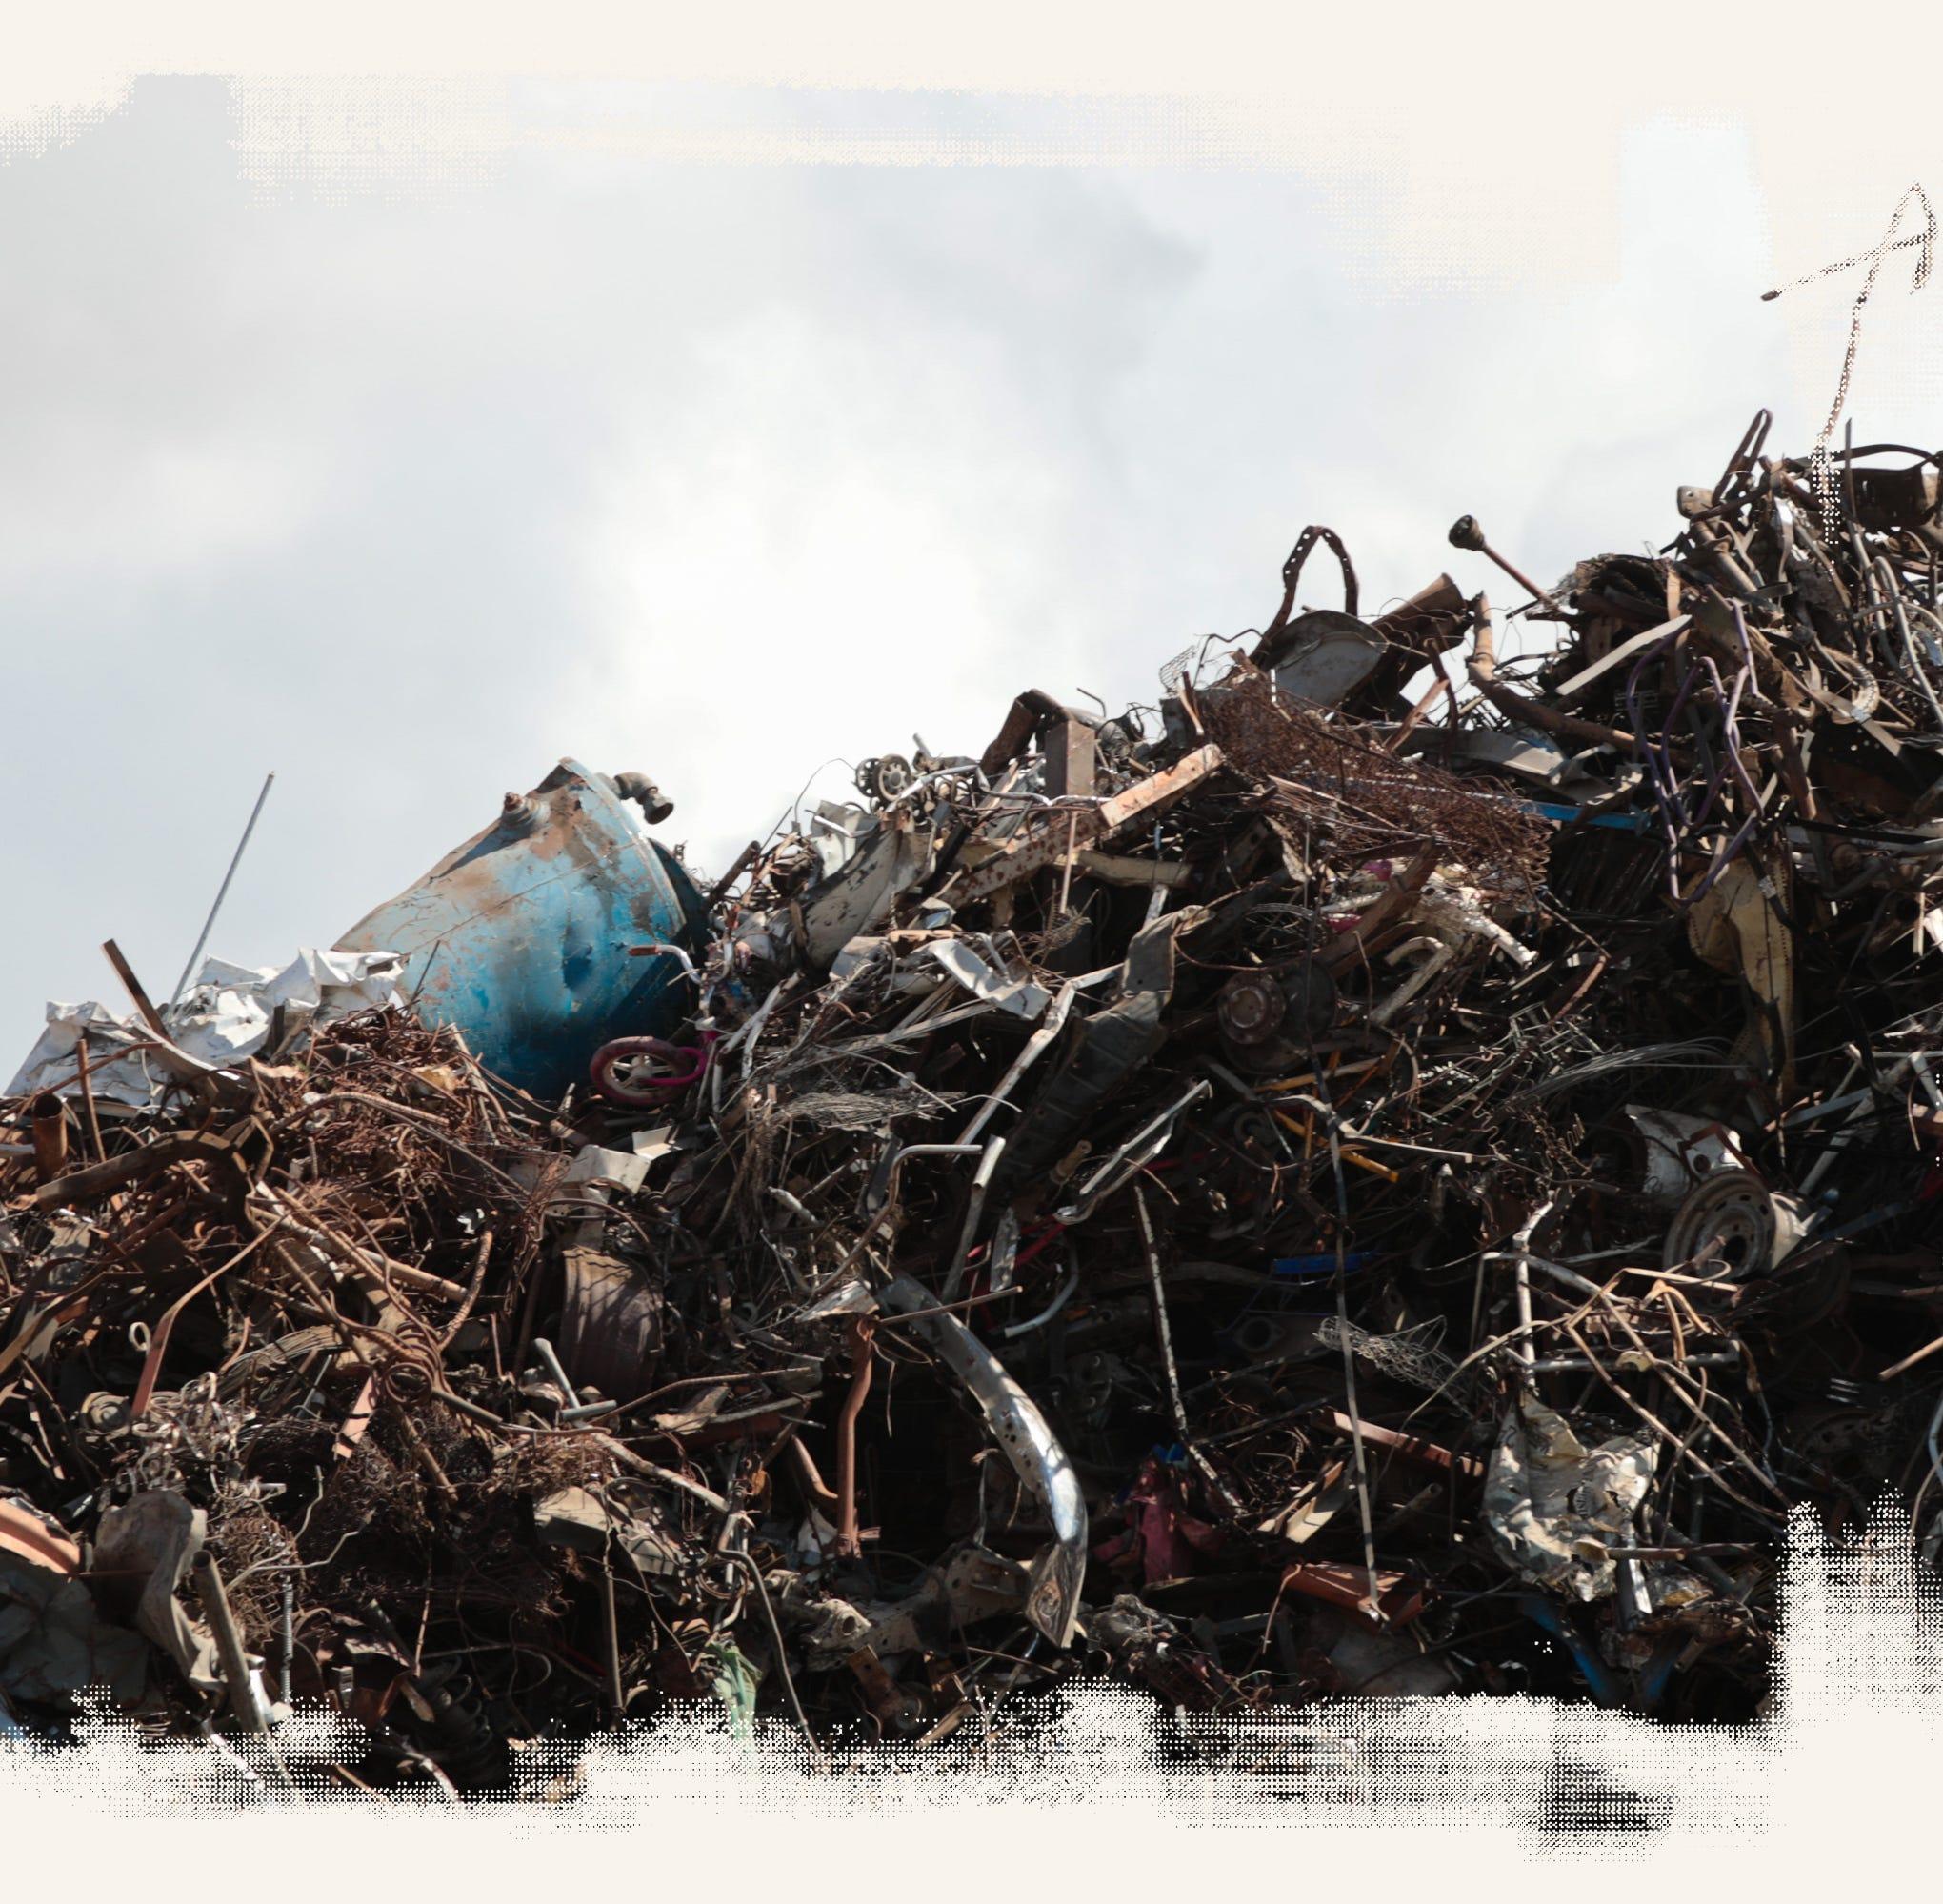 Un basurero tóxico prolifera en la frontera